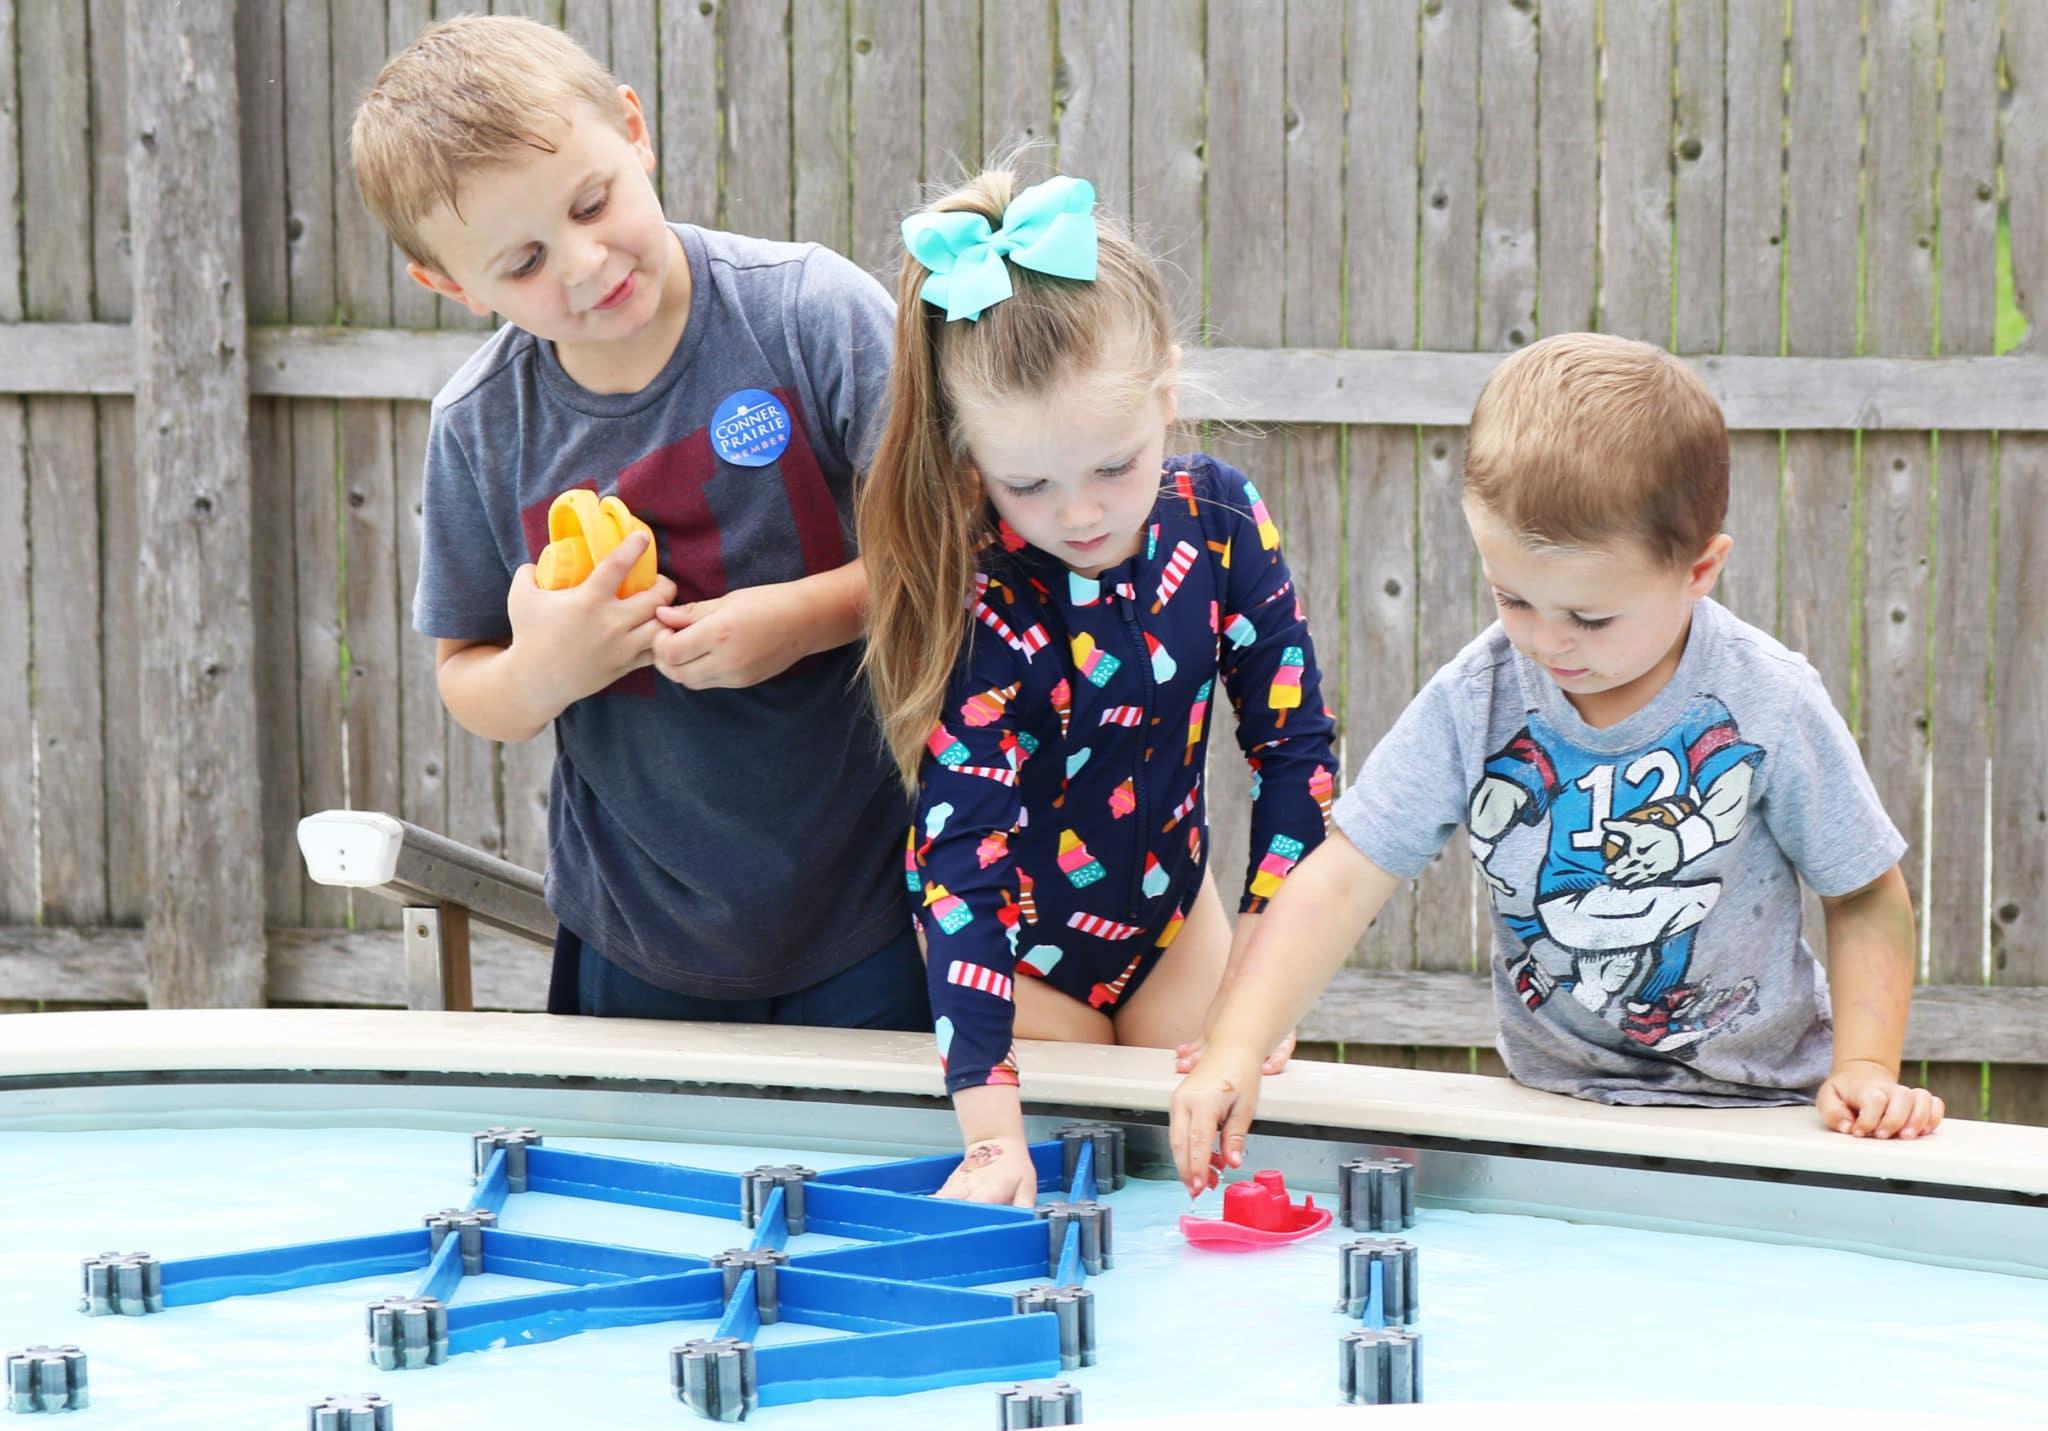 Kids exploring splash park